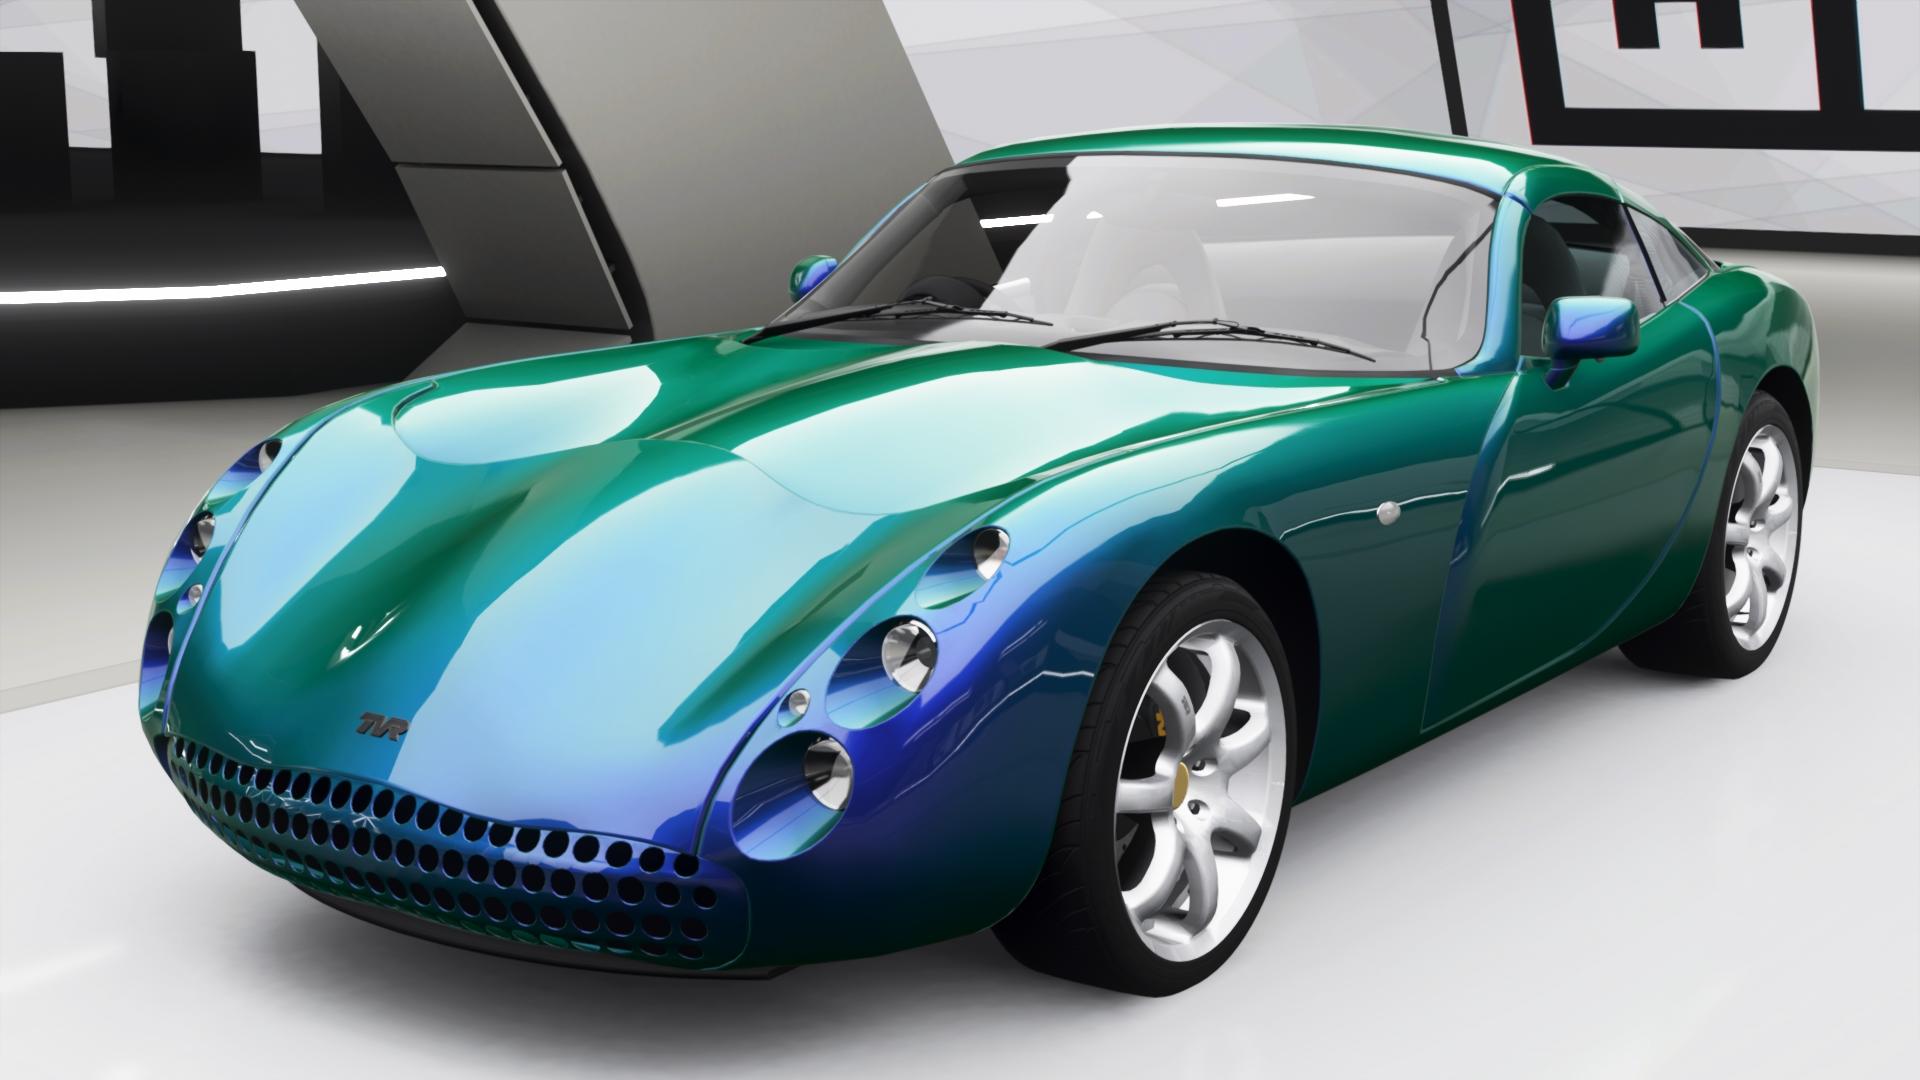 TVR Tuscan S | Forza Motorsport Wiki | FANDOM powered by Wikia